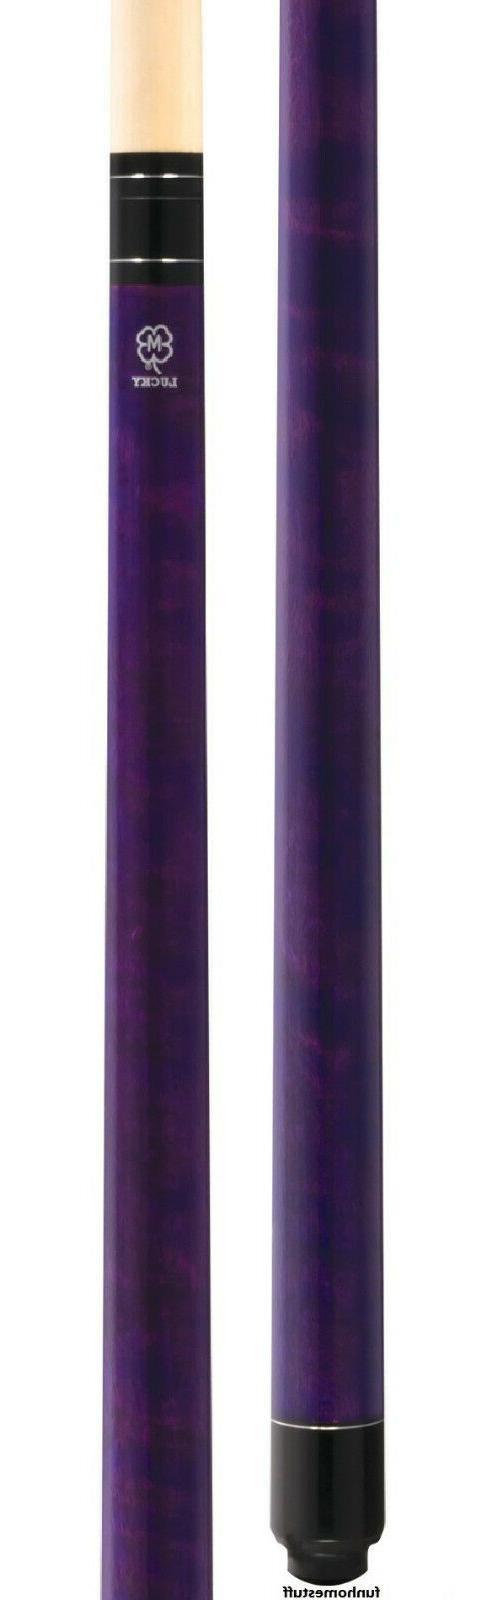 purple lucky l69 maple 58 billiard pool